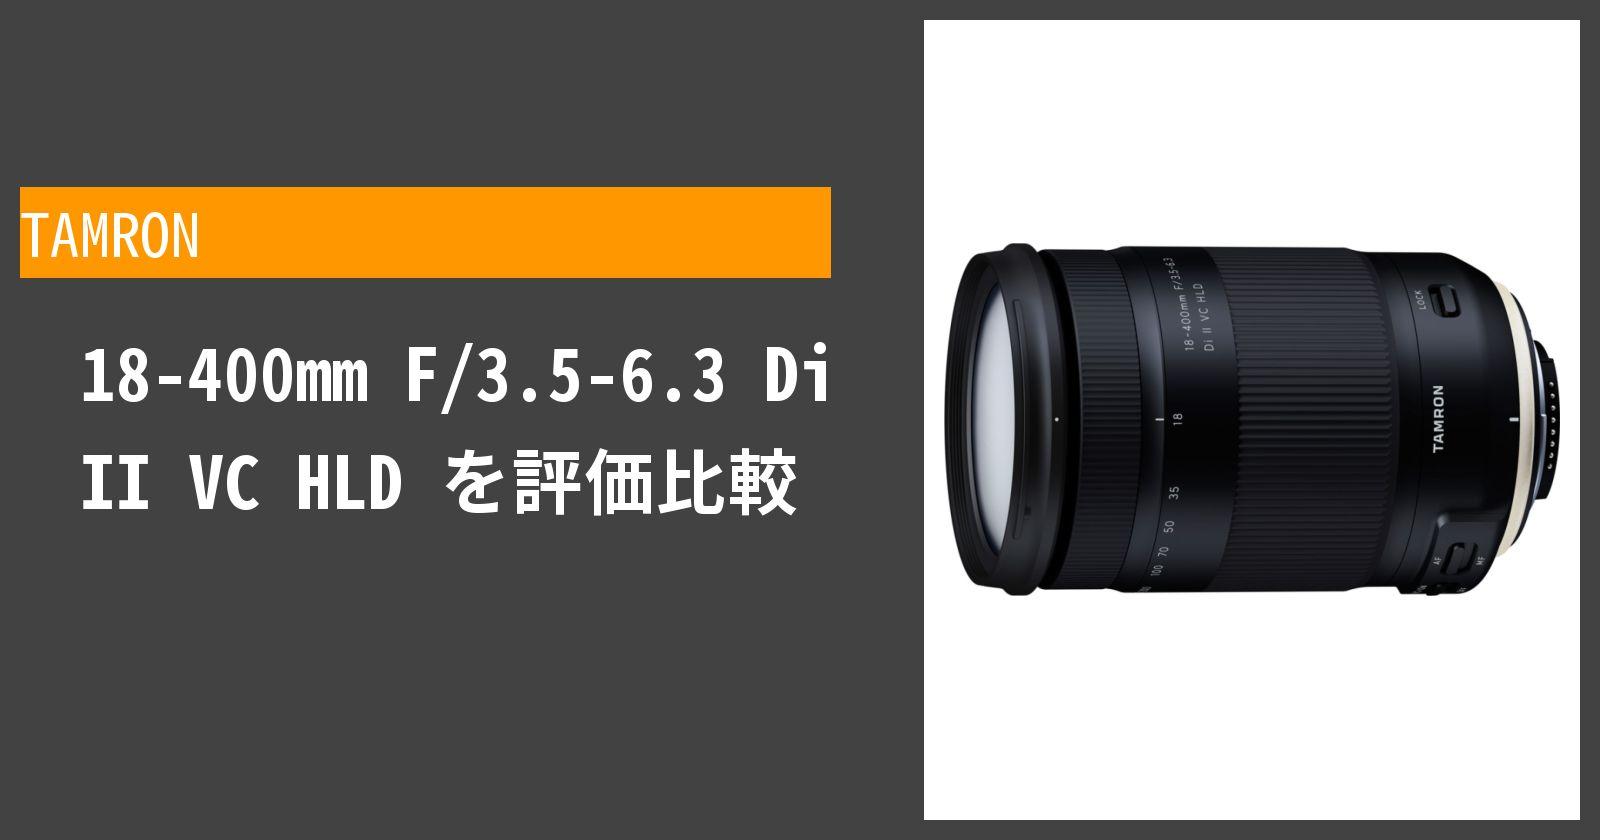 18-400mm F/3.5-6.3 Di II VC HLDを徹底評価